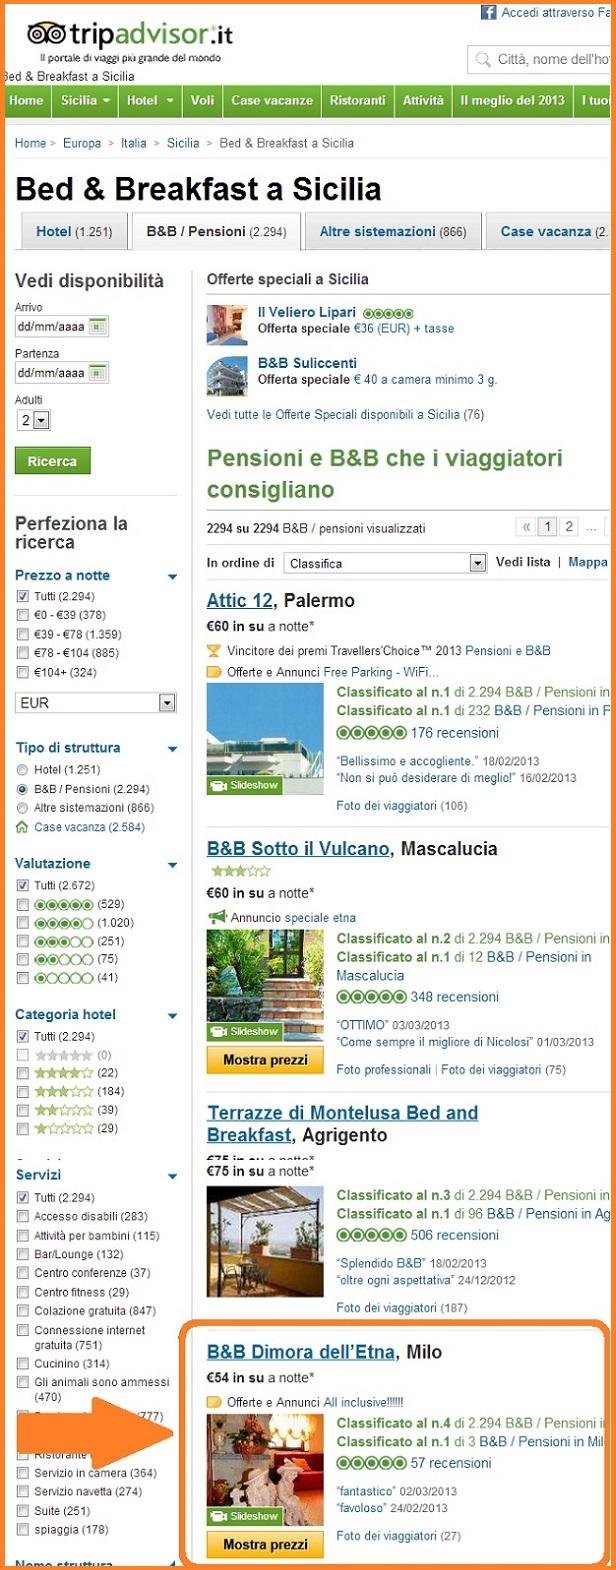 dimora-etna-milo-tripadvisor-sicilia